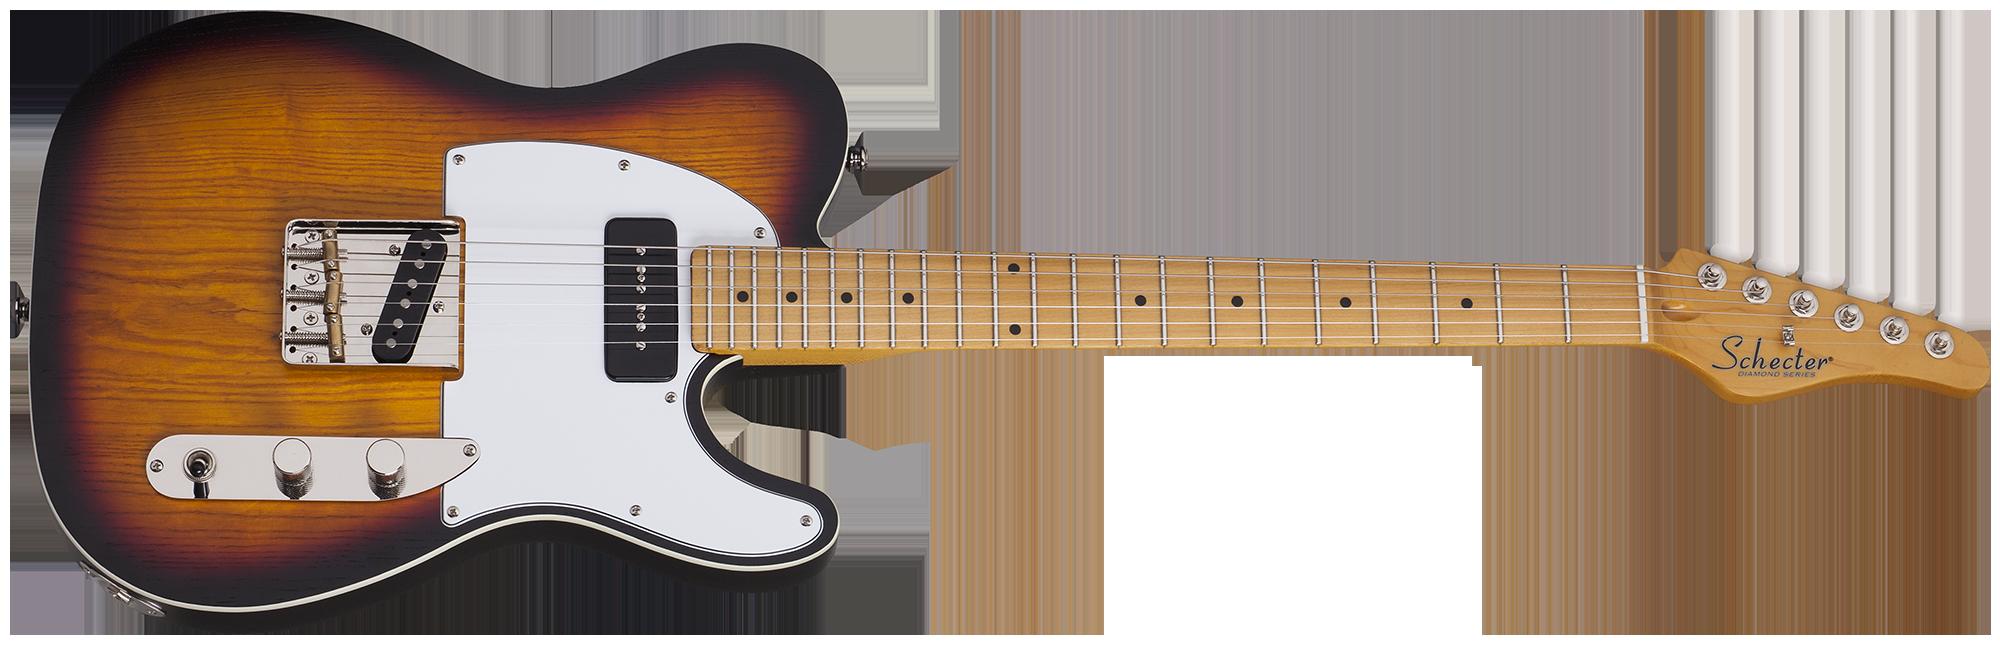 PT Special 3-Tone Sunburst Pearl (3TSBP) SKU #665